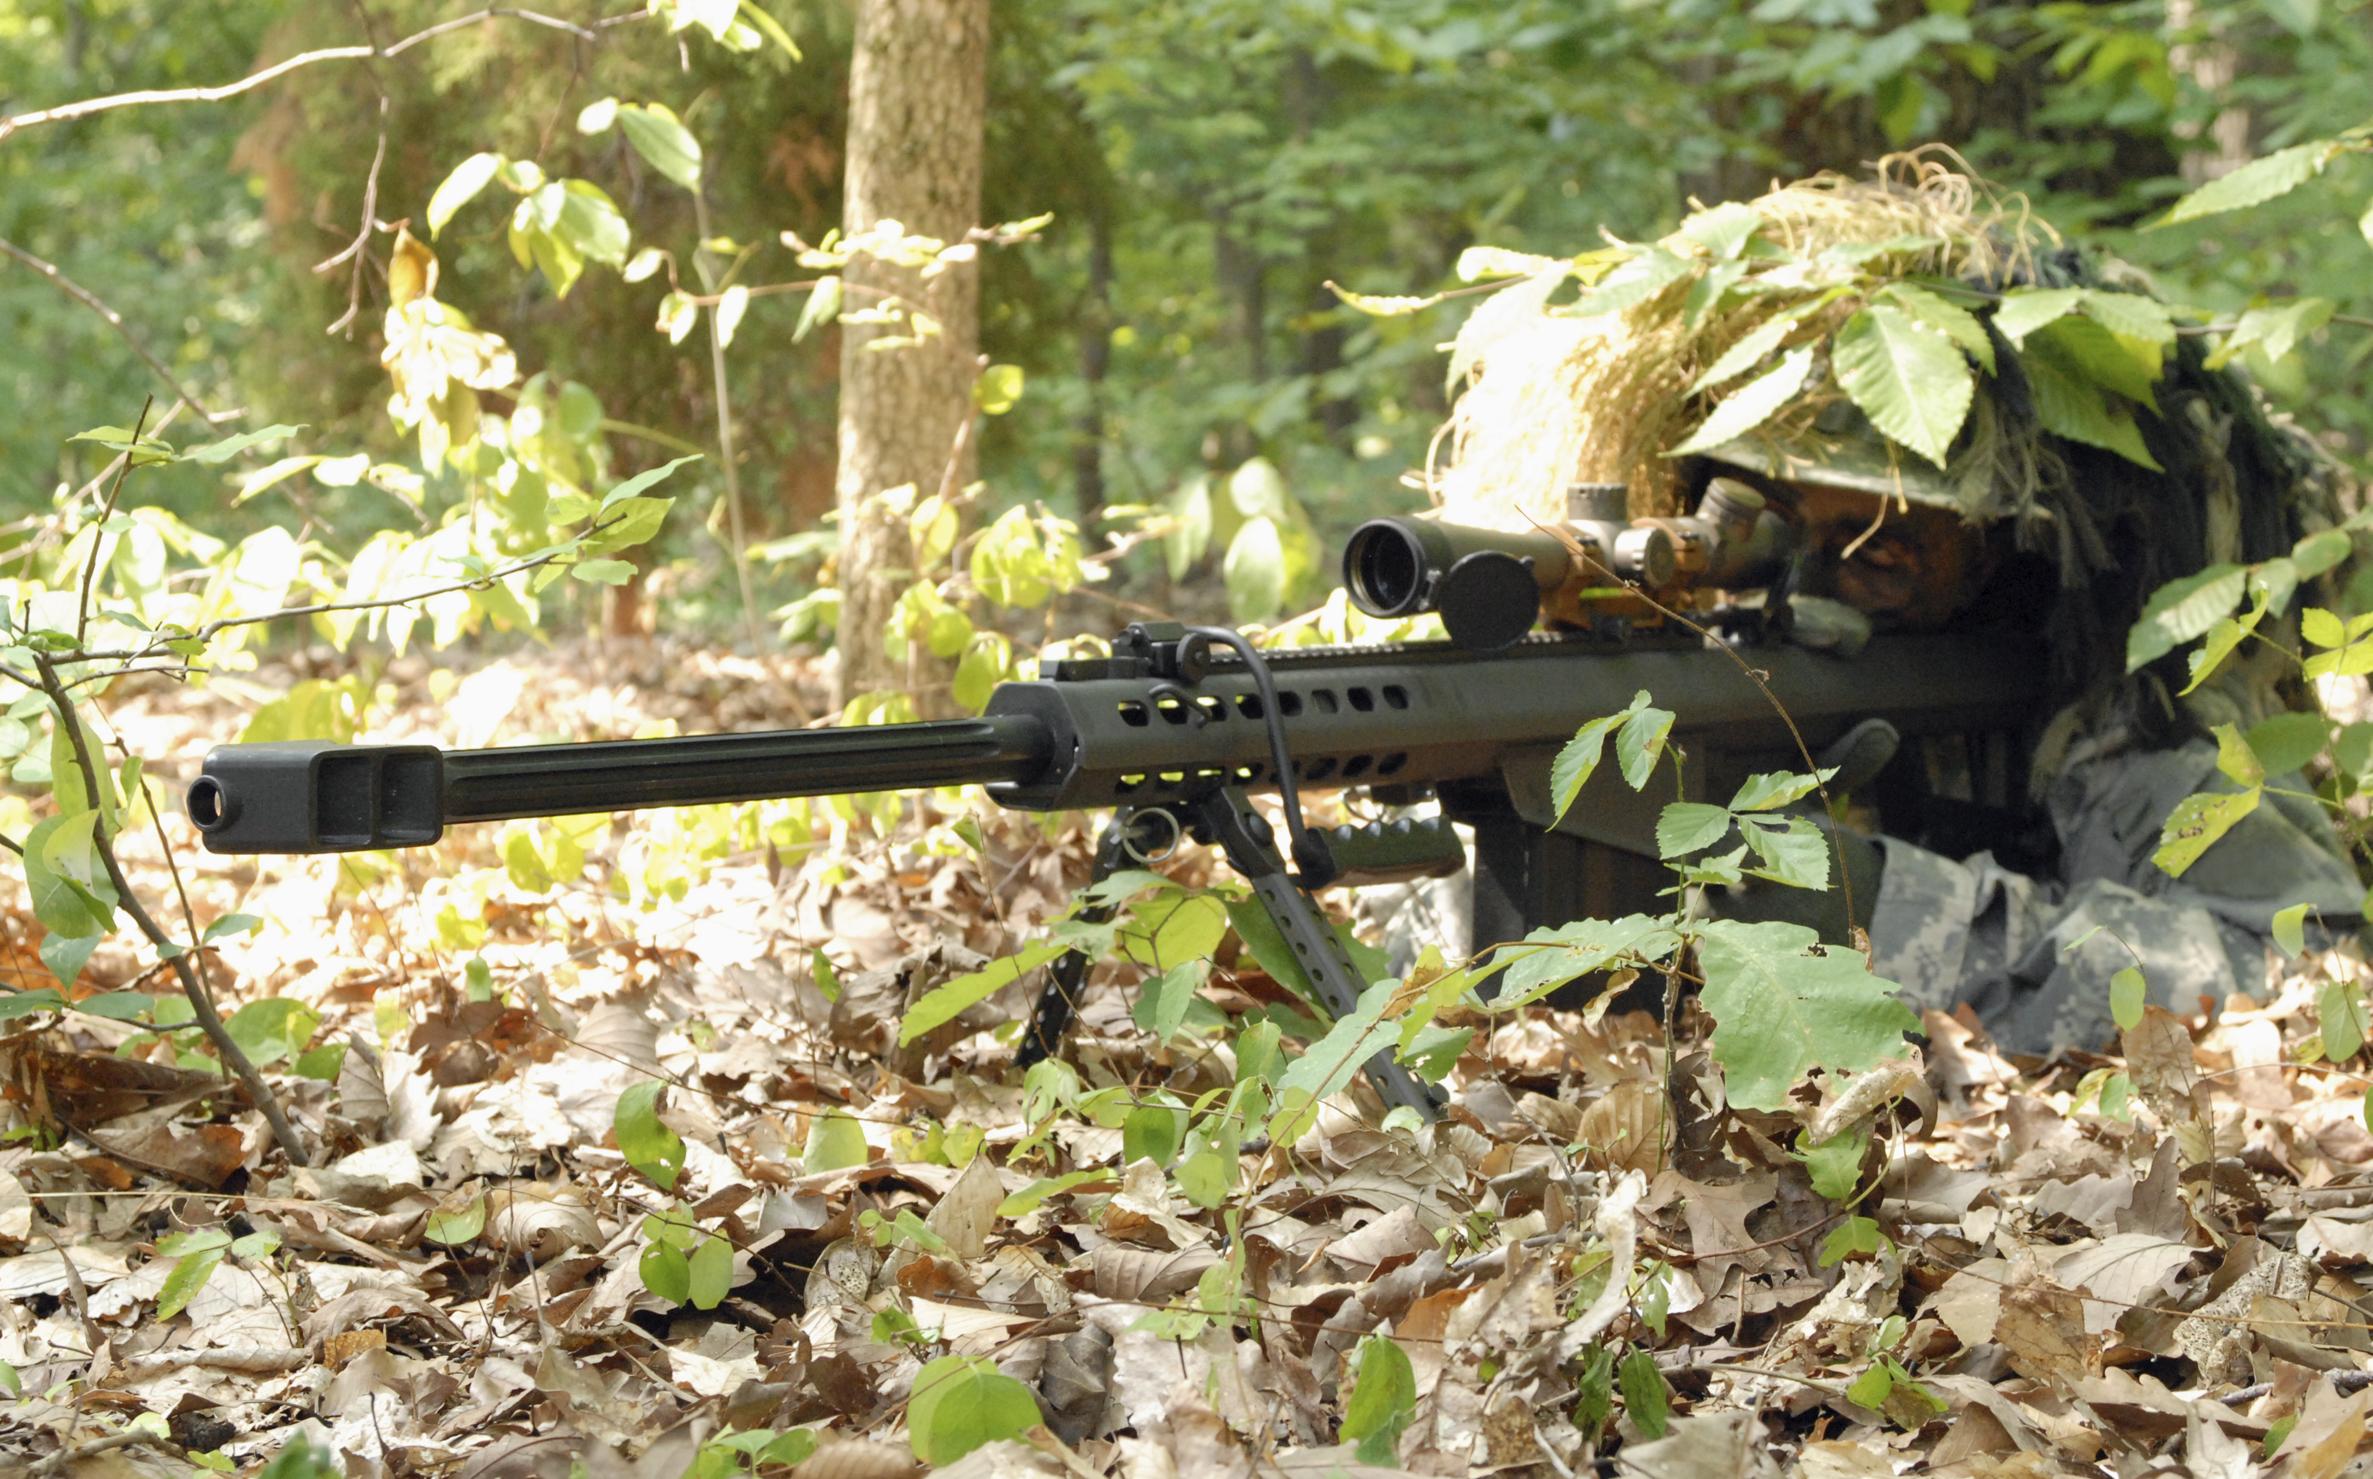 Militär - Scharfschütze  Hintergrundbild